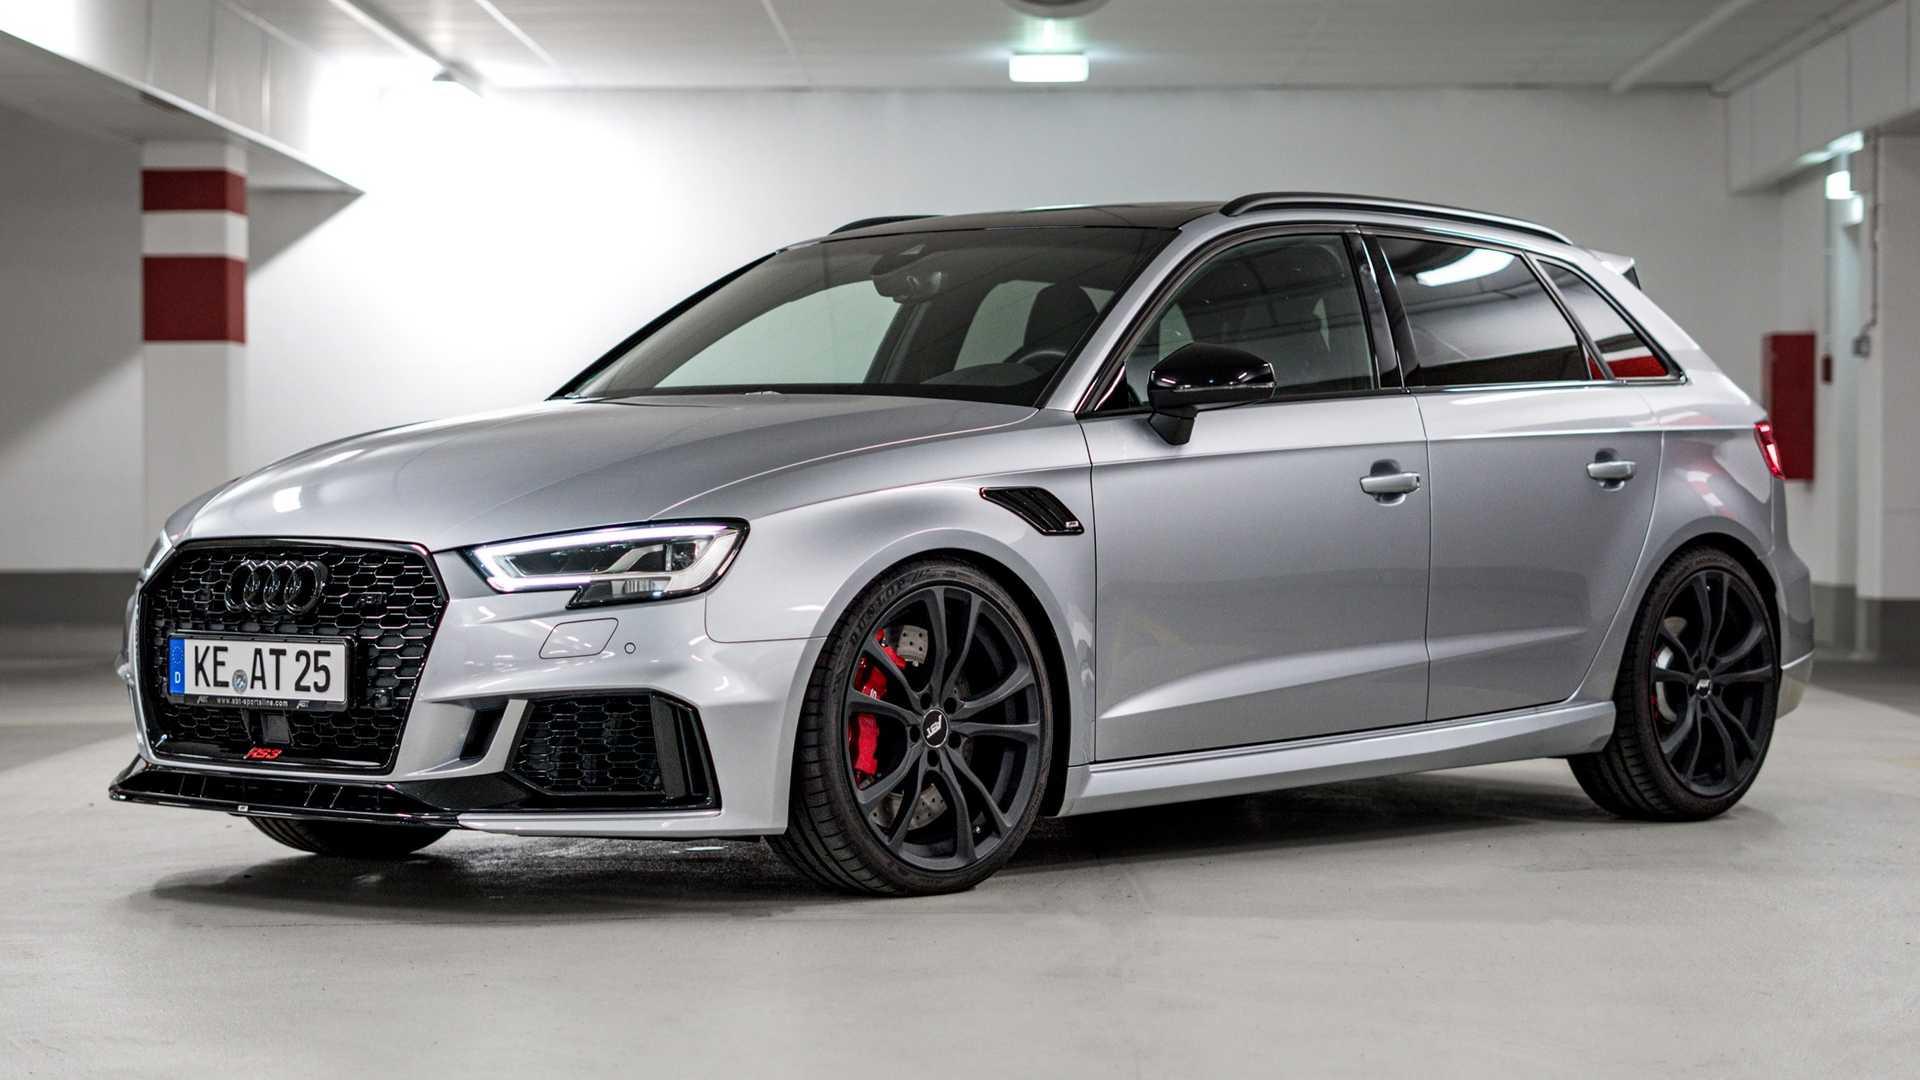 Audi-RS3-Sportback-by-ABT-Sportsline-5